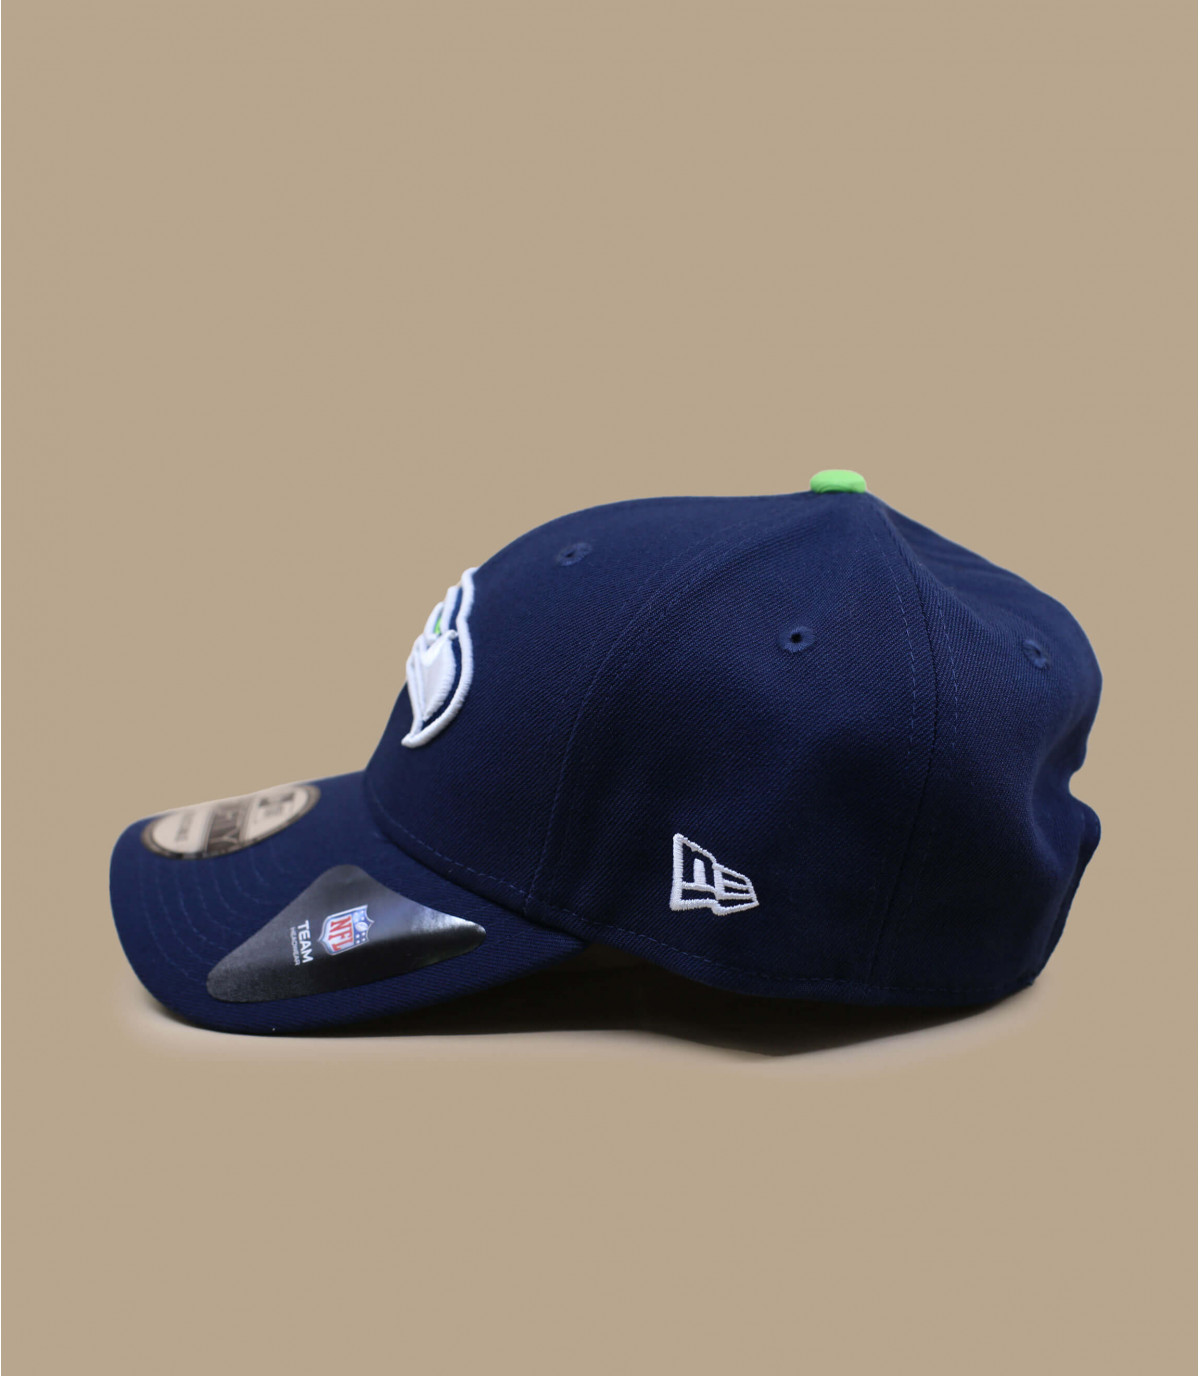 blue Seahawks cap - NFL The League Seahawks Team by New Era. Headict ac830dc7f19